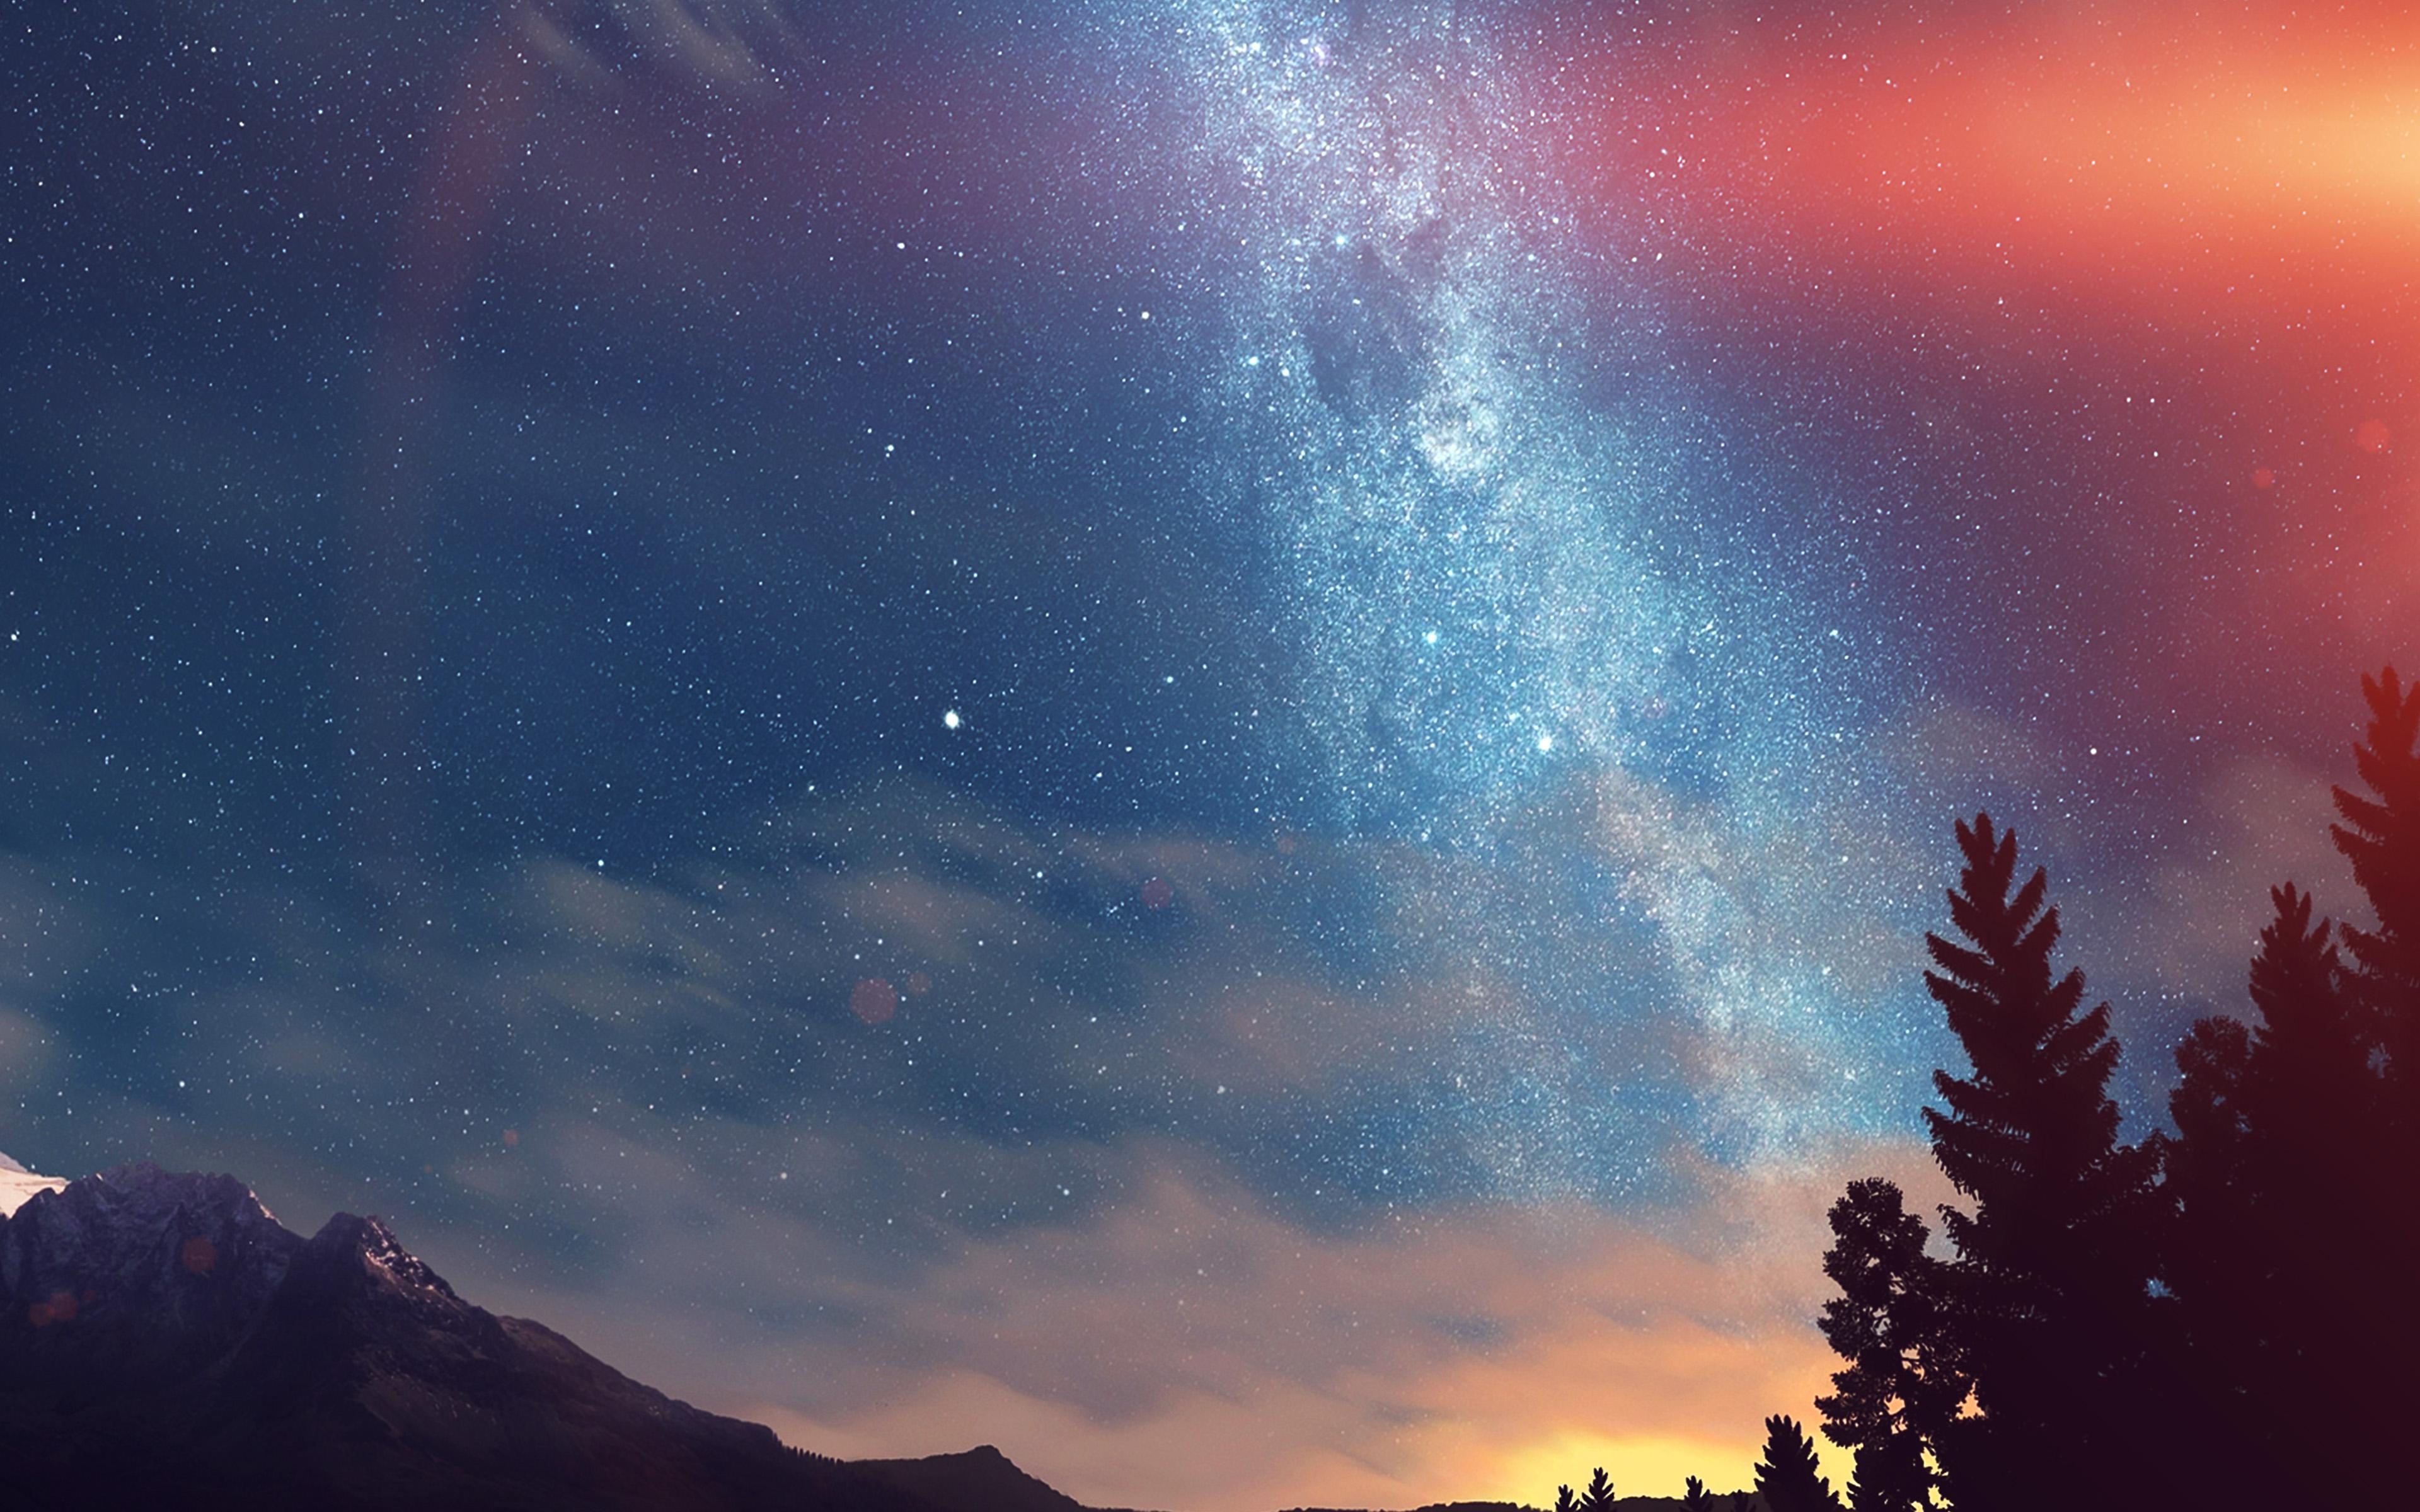 nd08-wonderful-tonight-space-star-sunset-mountain-flare ...